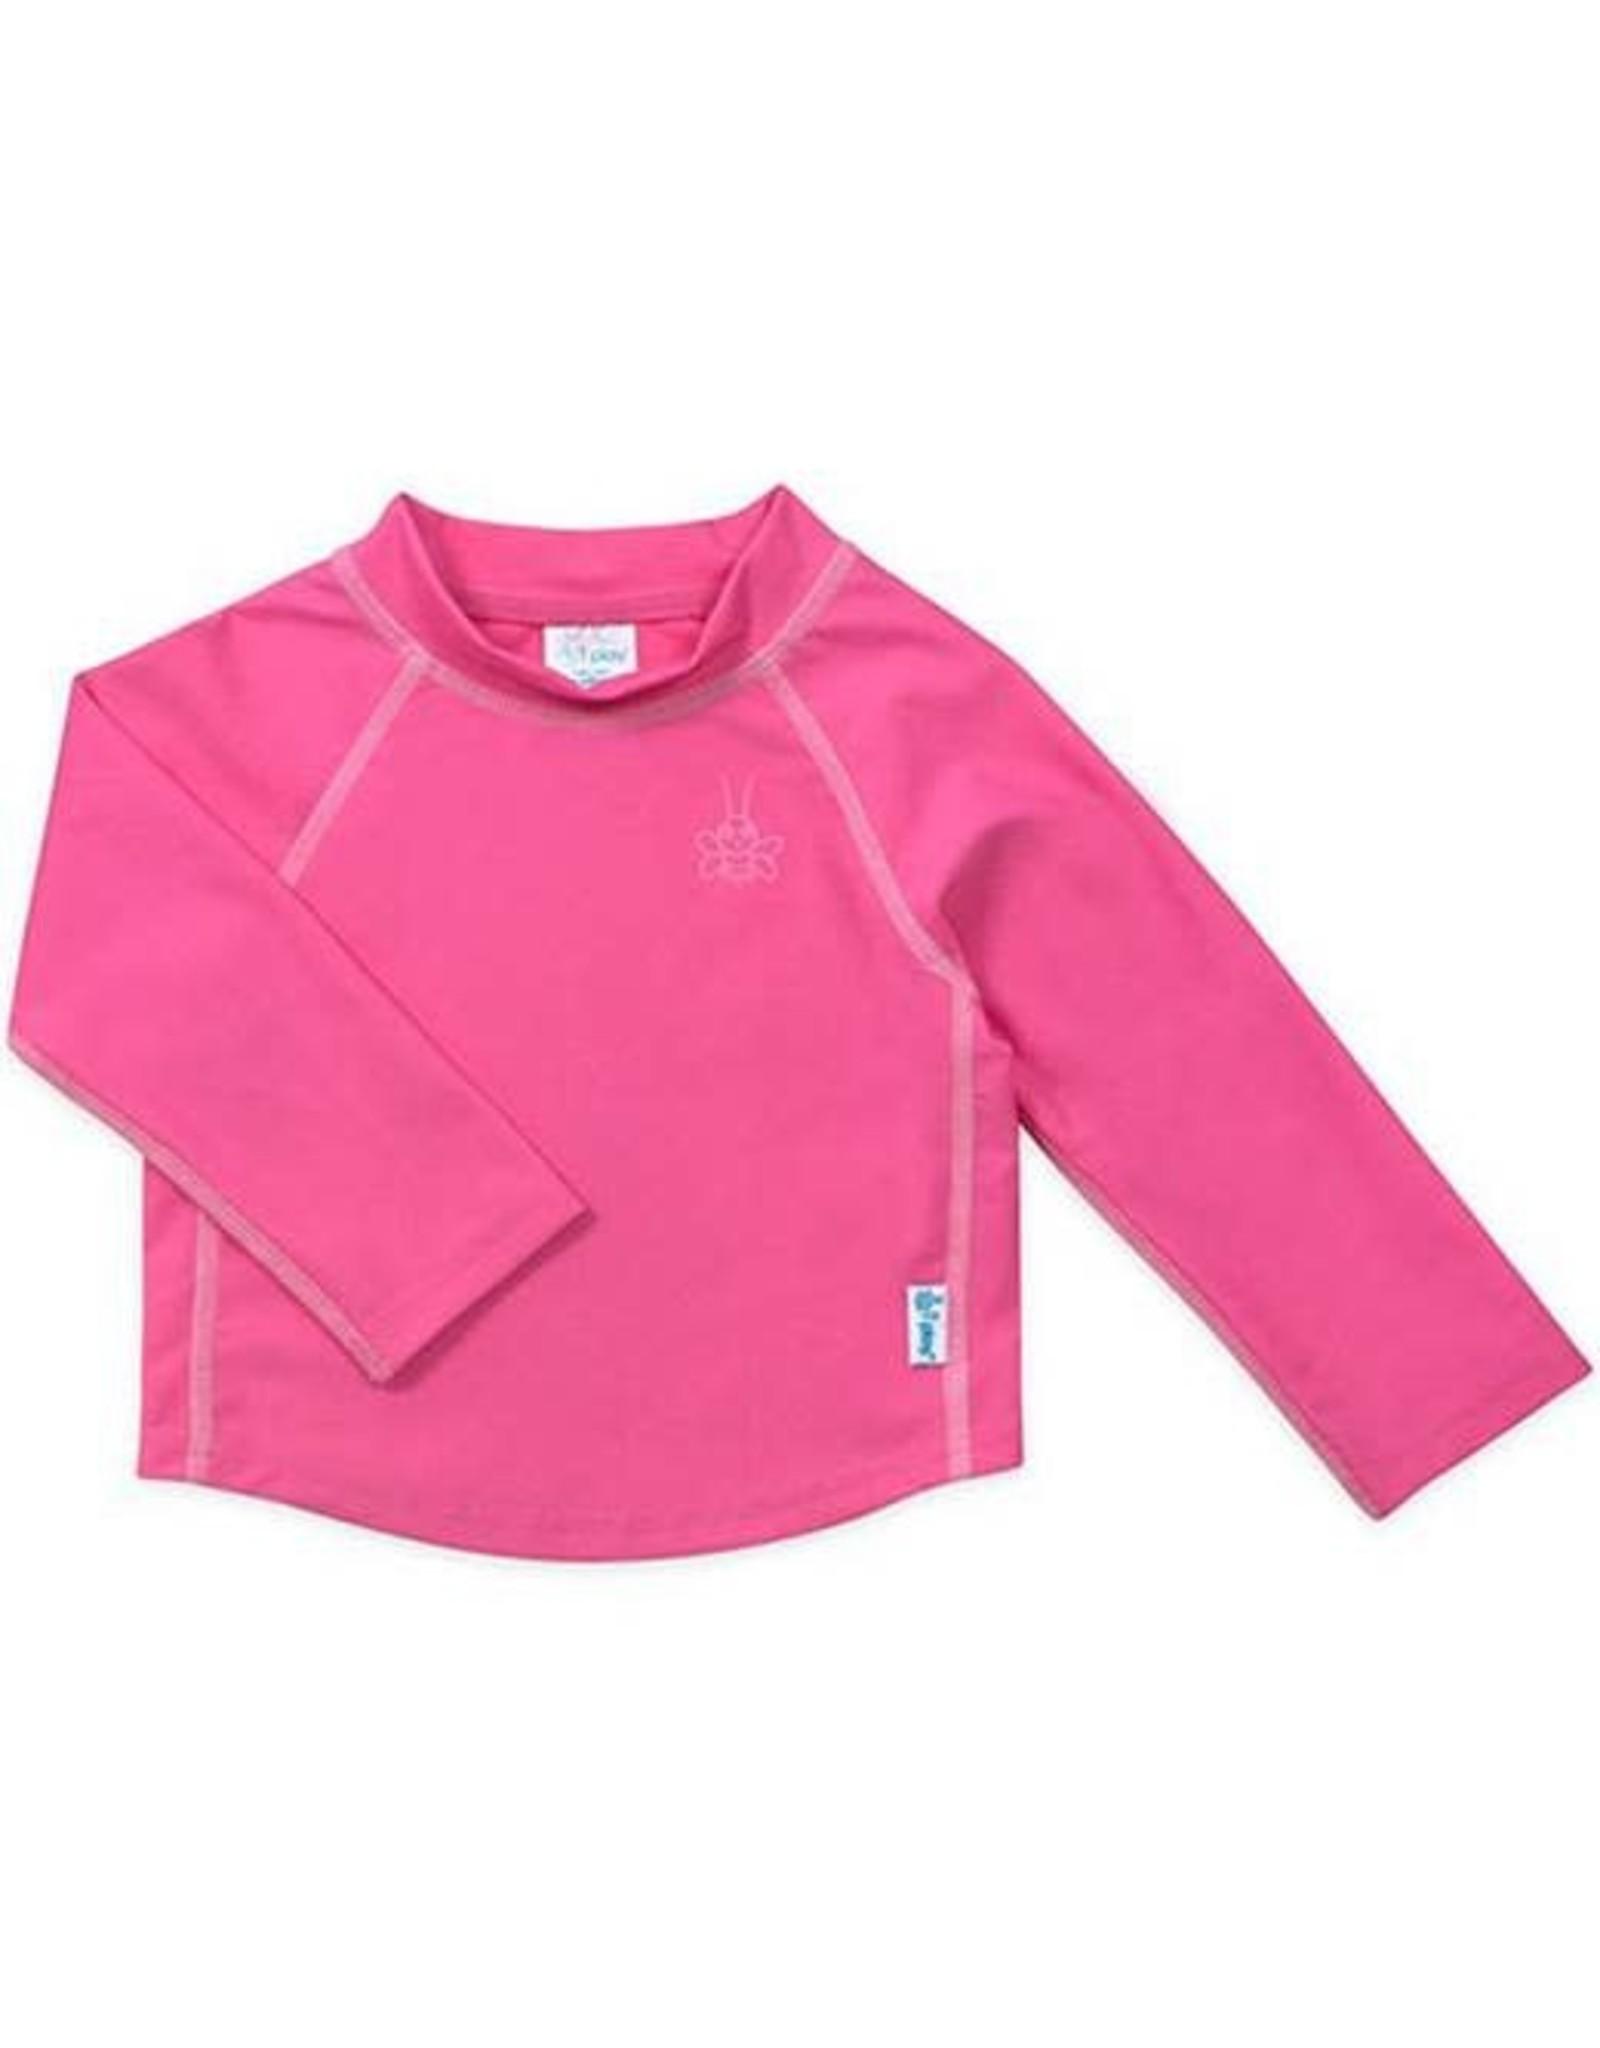 iPlay Long Sleeve Rashguard Shirt, Hot Pink